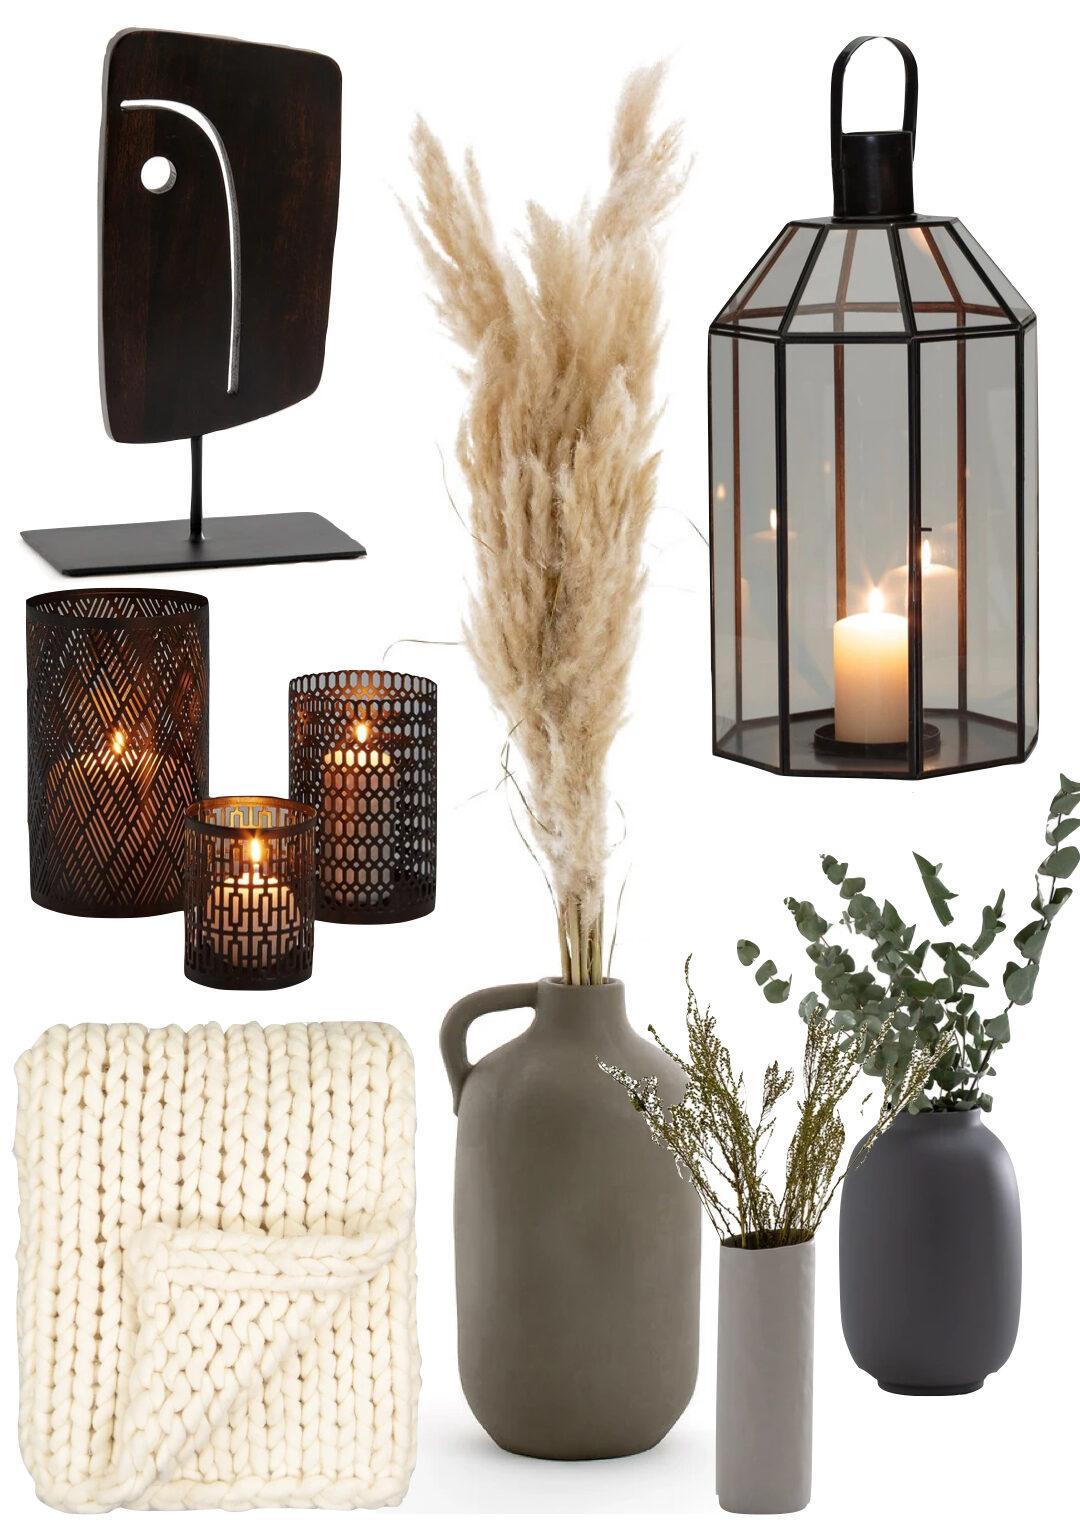 accessoire astuce objet rendre chambre cosy cocooning chaleureuse